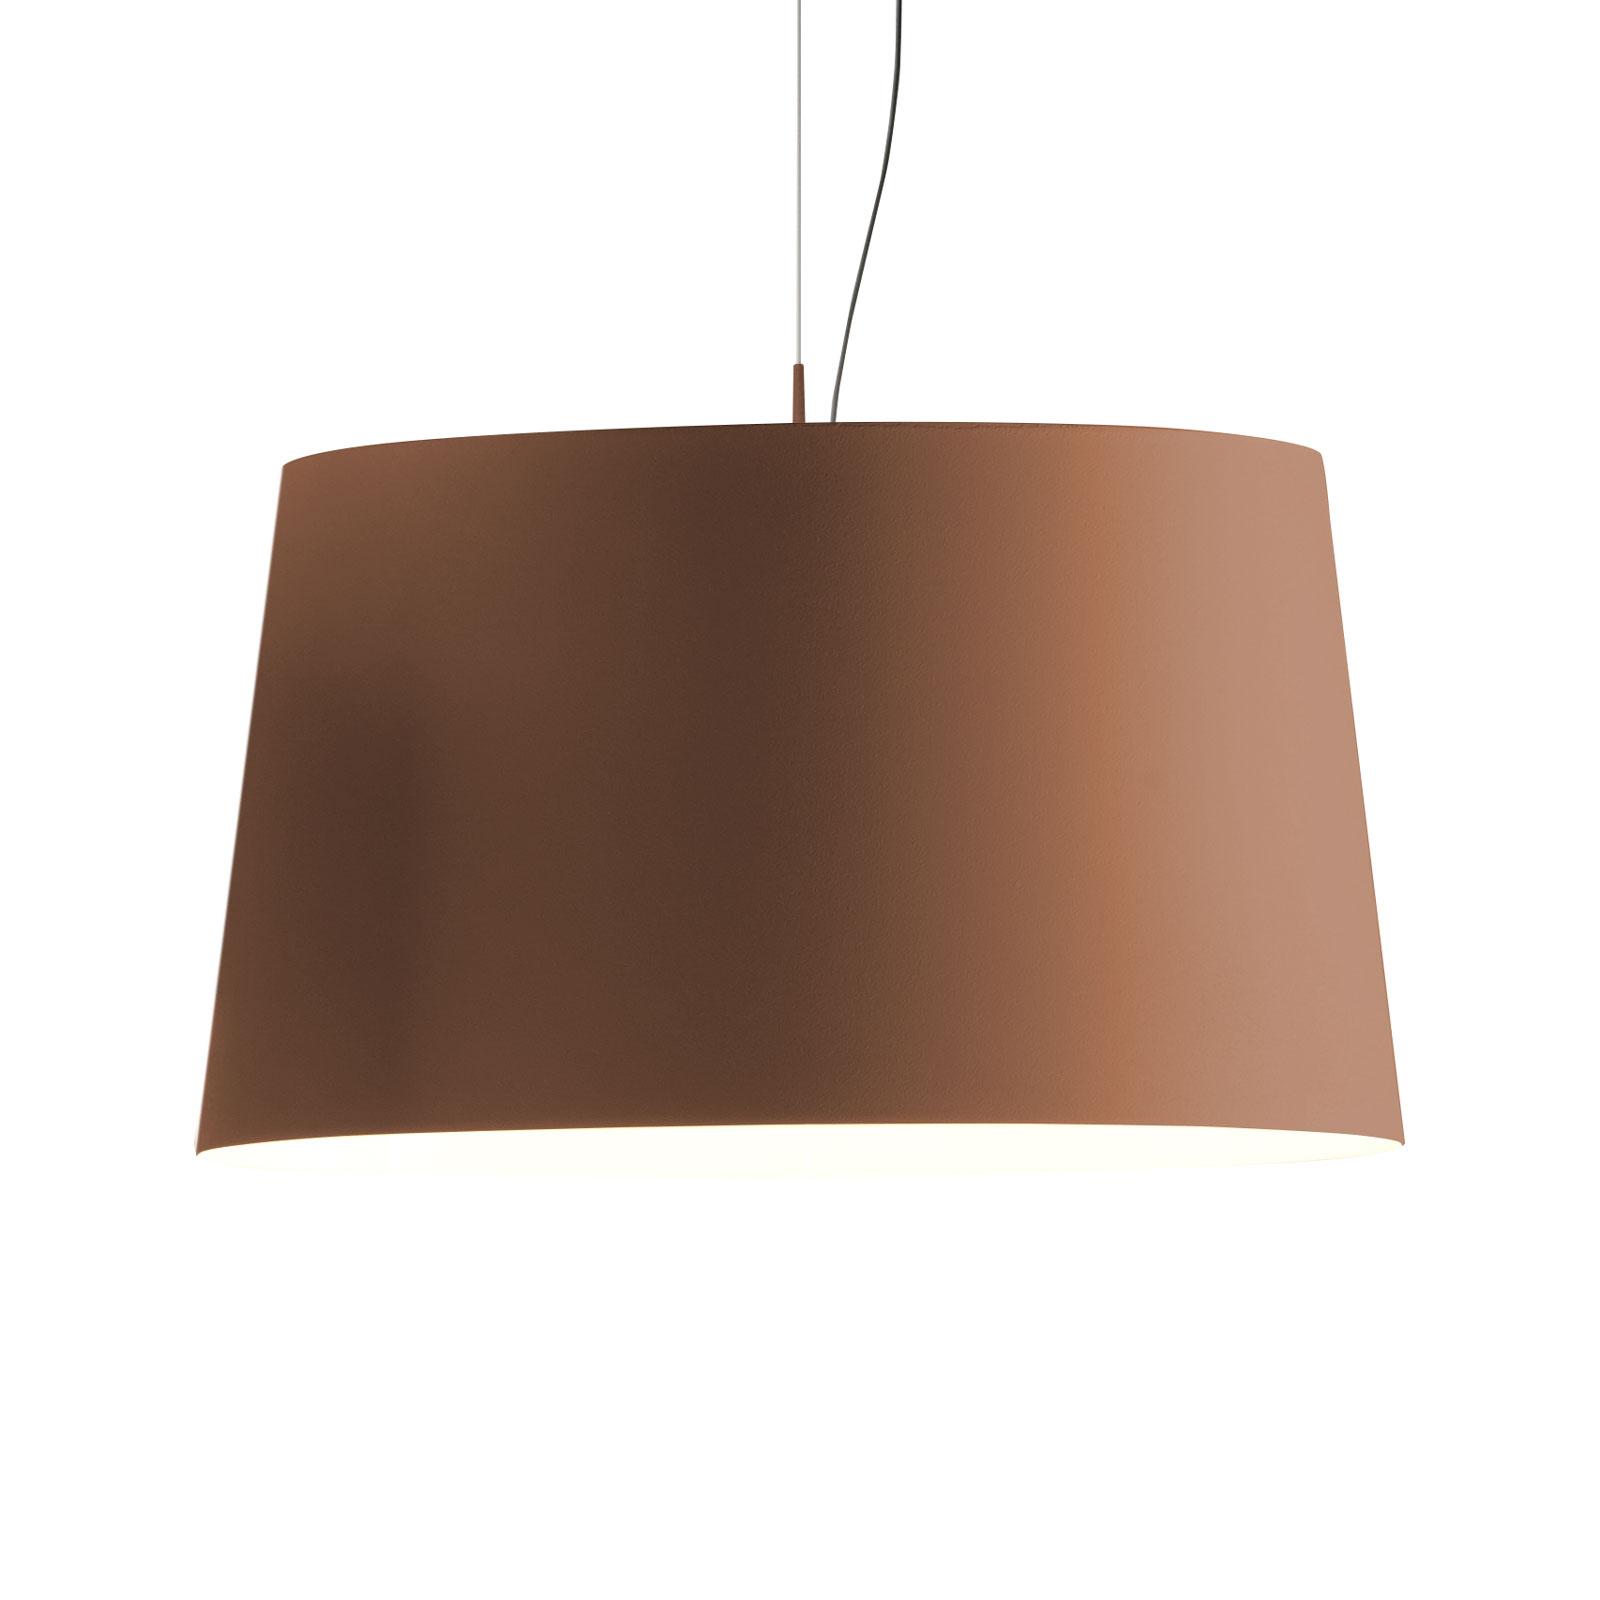 Vibia Warm 4926 hanglamp, beige